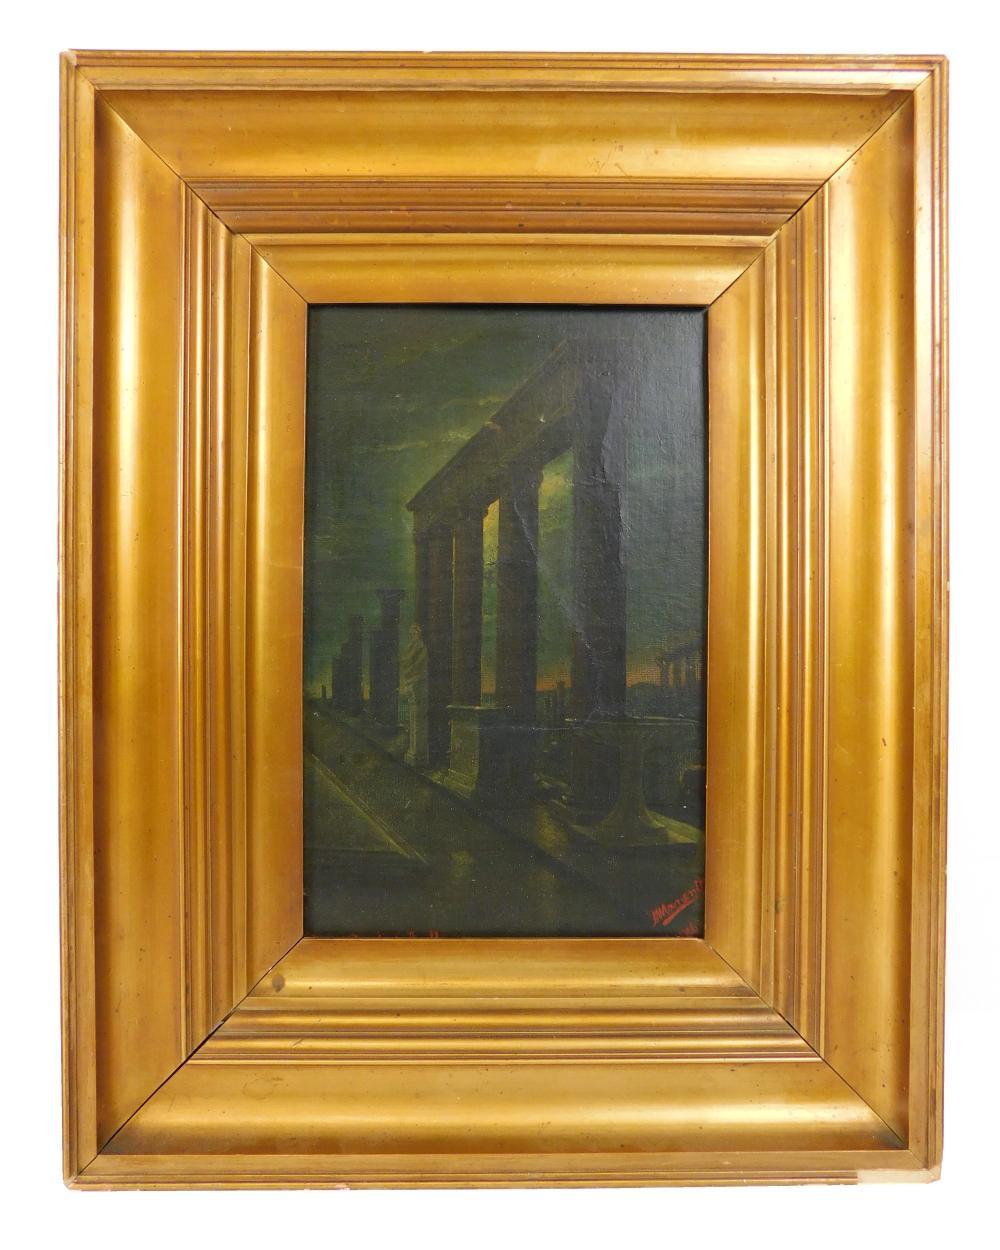 """Pompei - Tempio d'Apollo"", oil on relined canvas, nighttime scene of classical columns receding into distance, a few sculptures amo.."